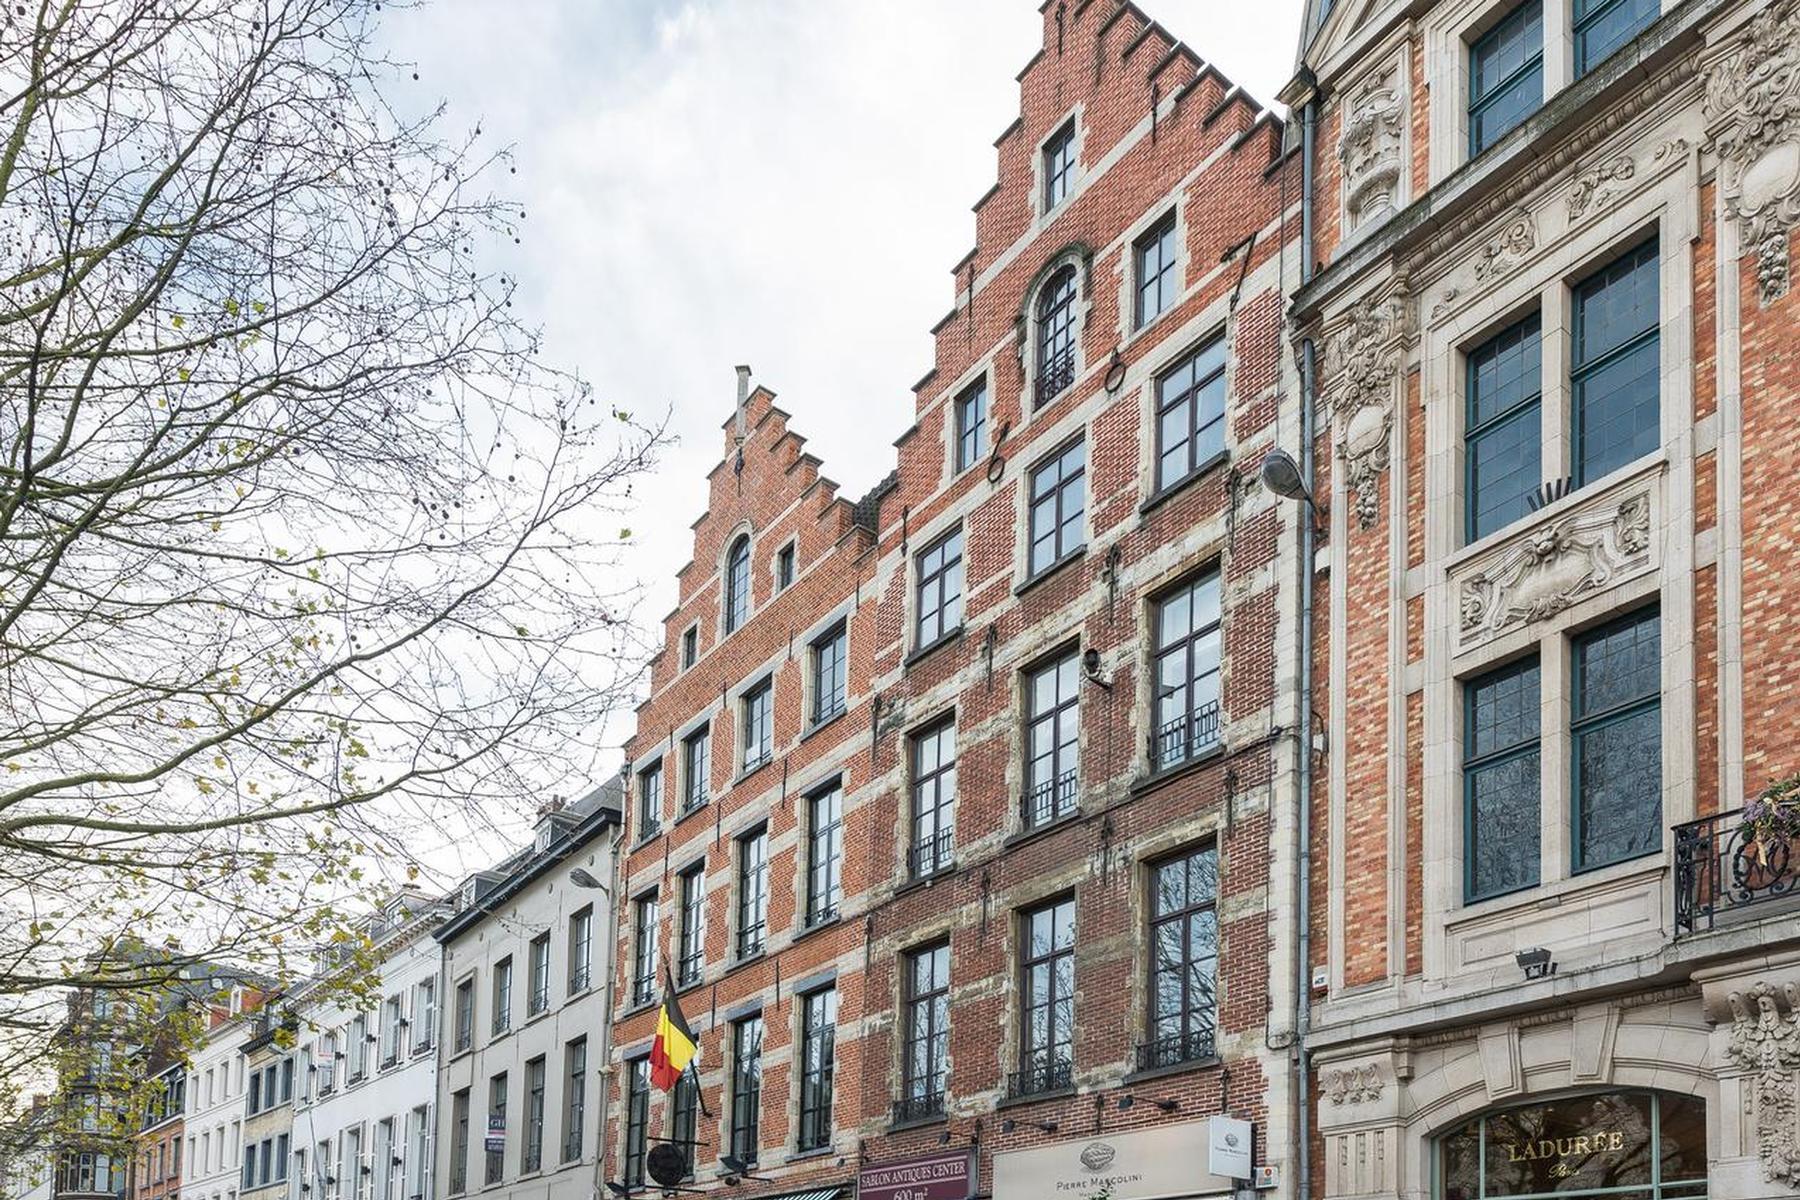 Appartamento per Vendita alle ore Bruxelles I Quartier du Sablon Brussels, Brussels, 1000 Belgio